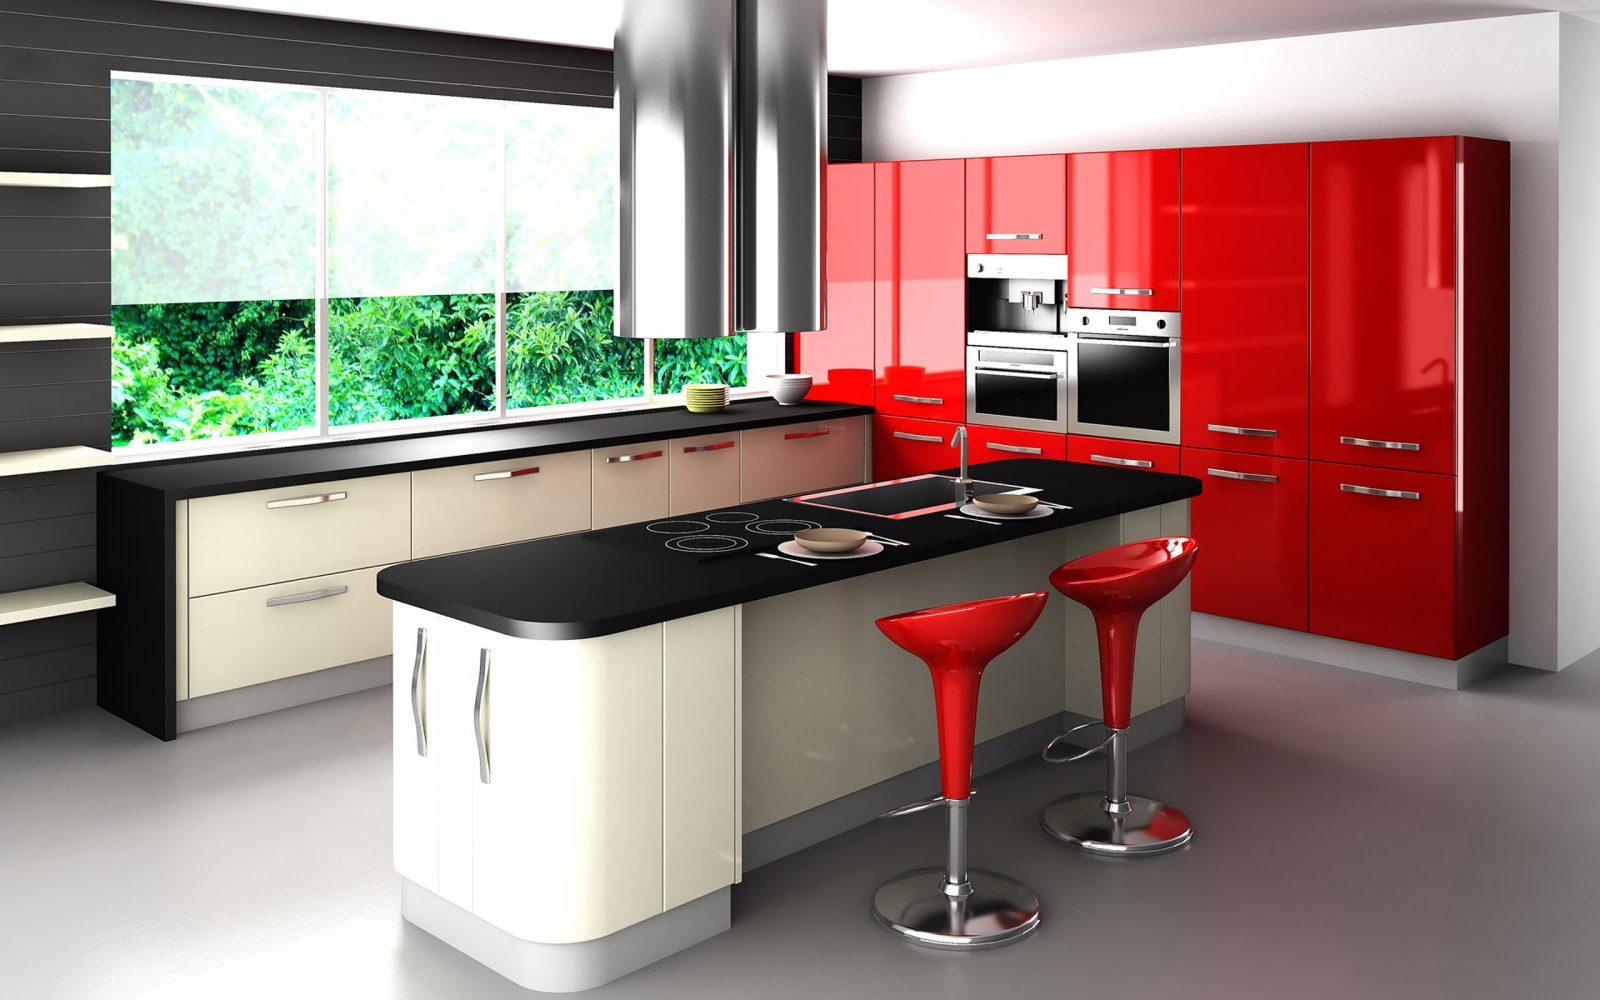 Claves para crear una cocina moderna - Cocinas amuebladas modernas ...